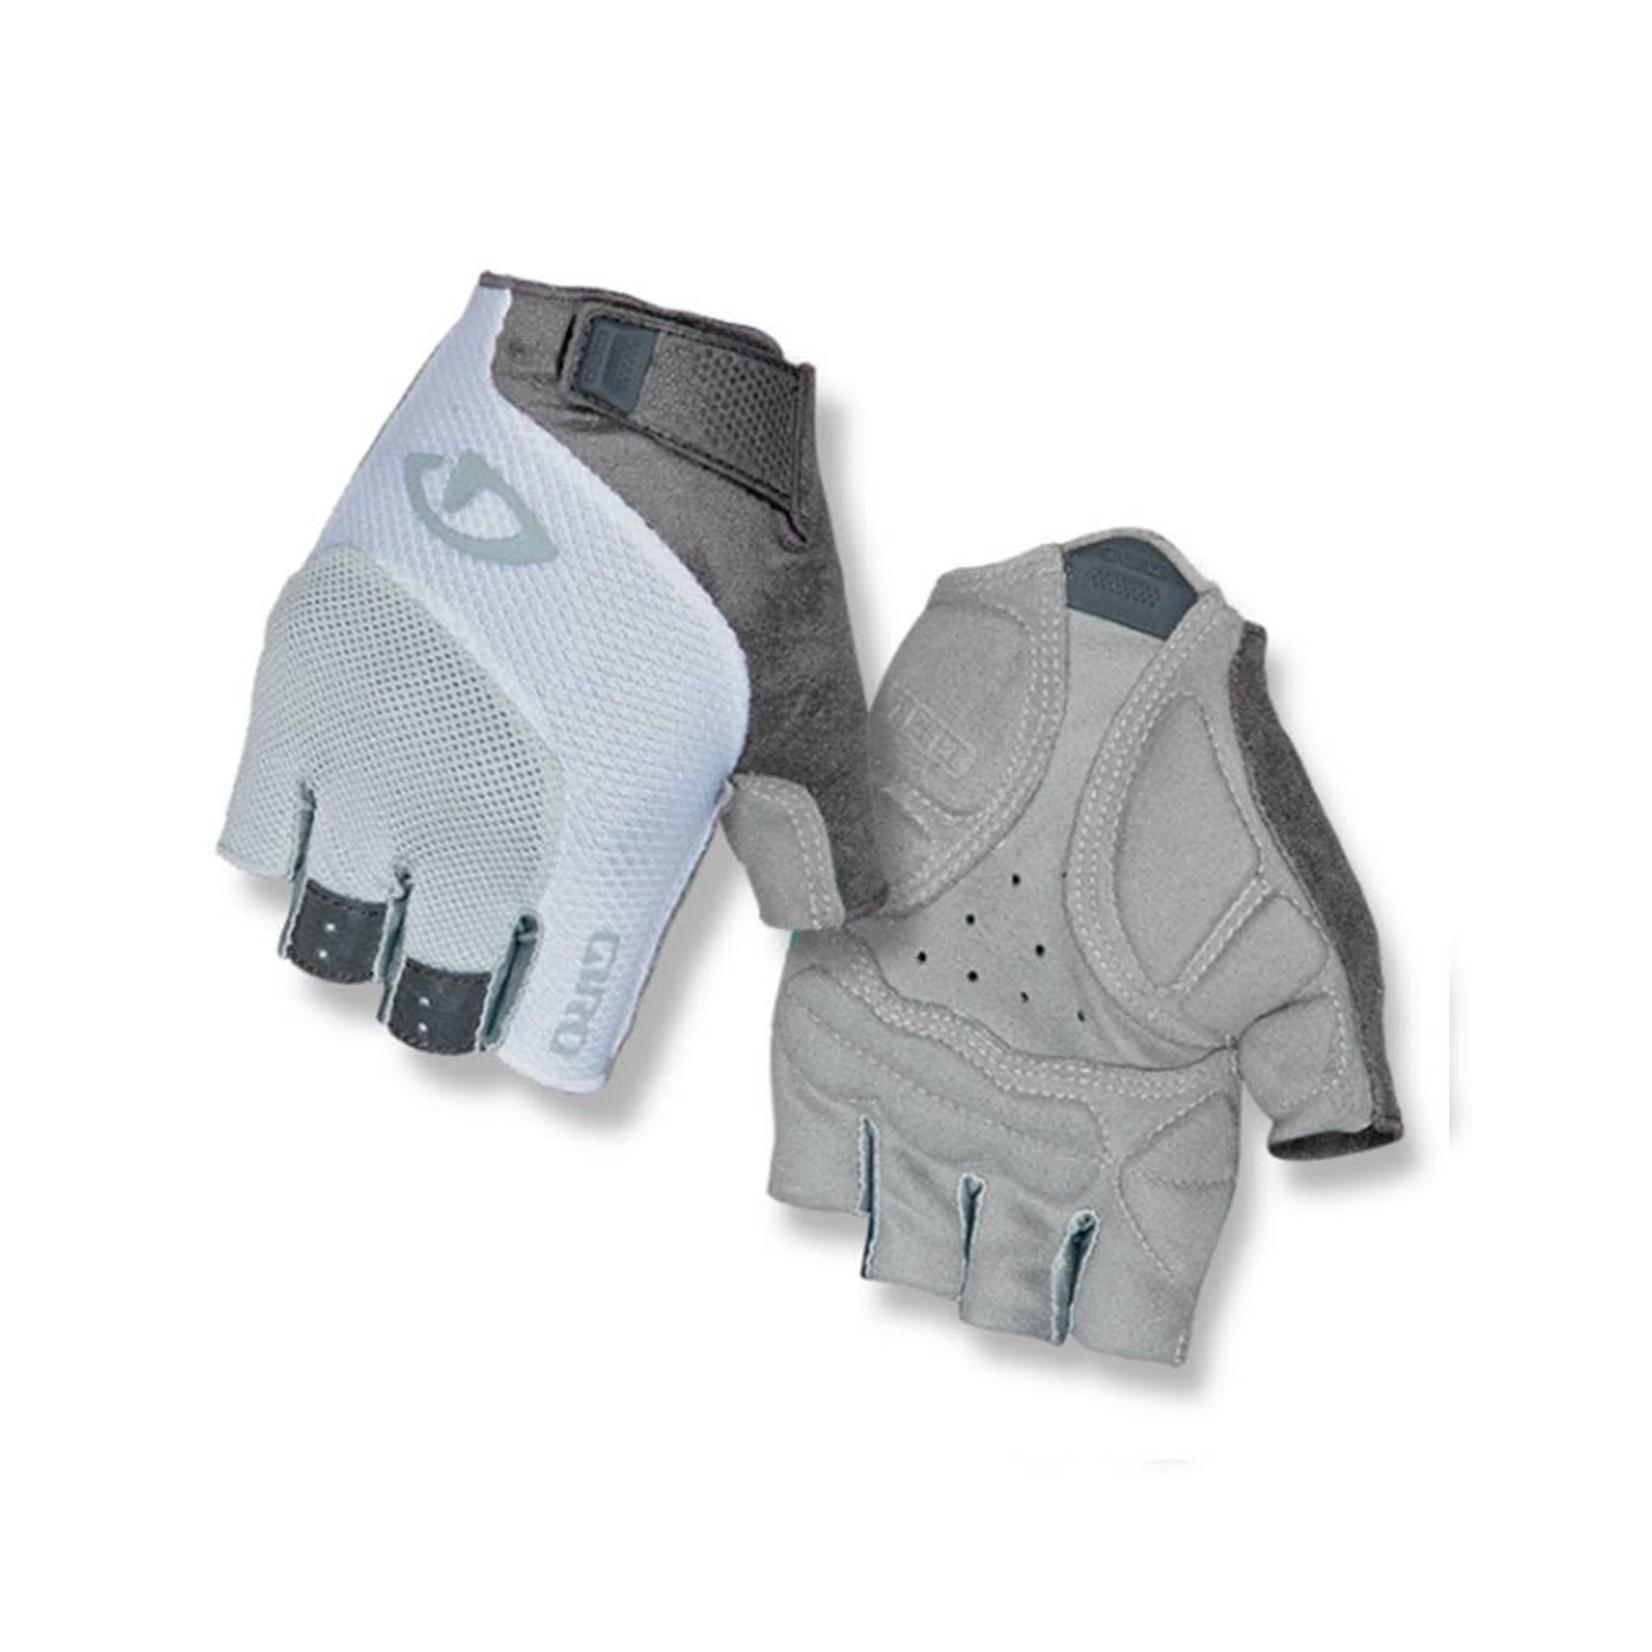 Giro Tessa Gel Cycling Glove Grey/White